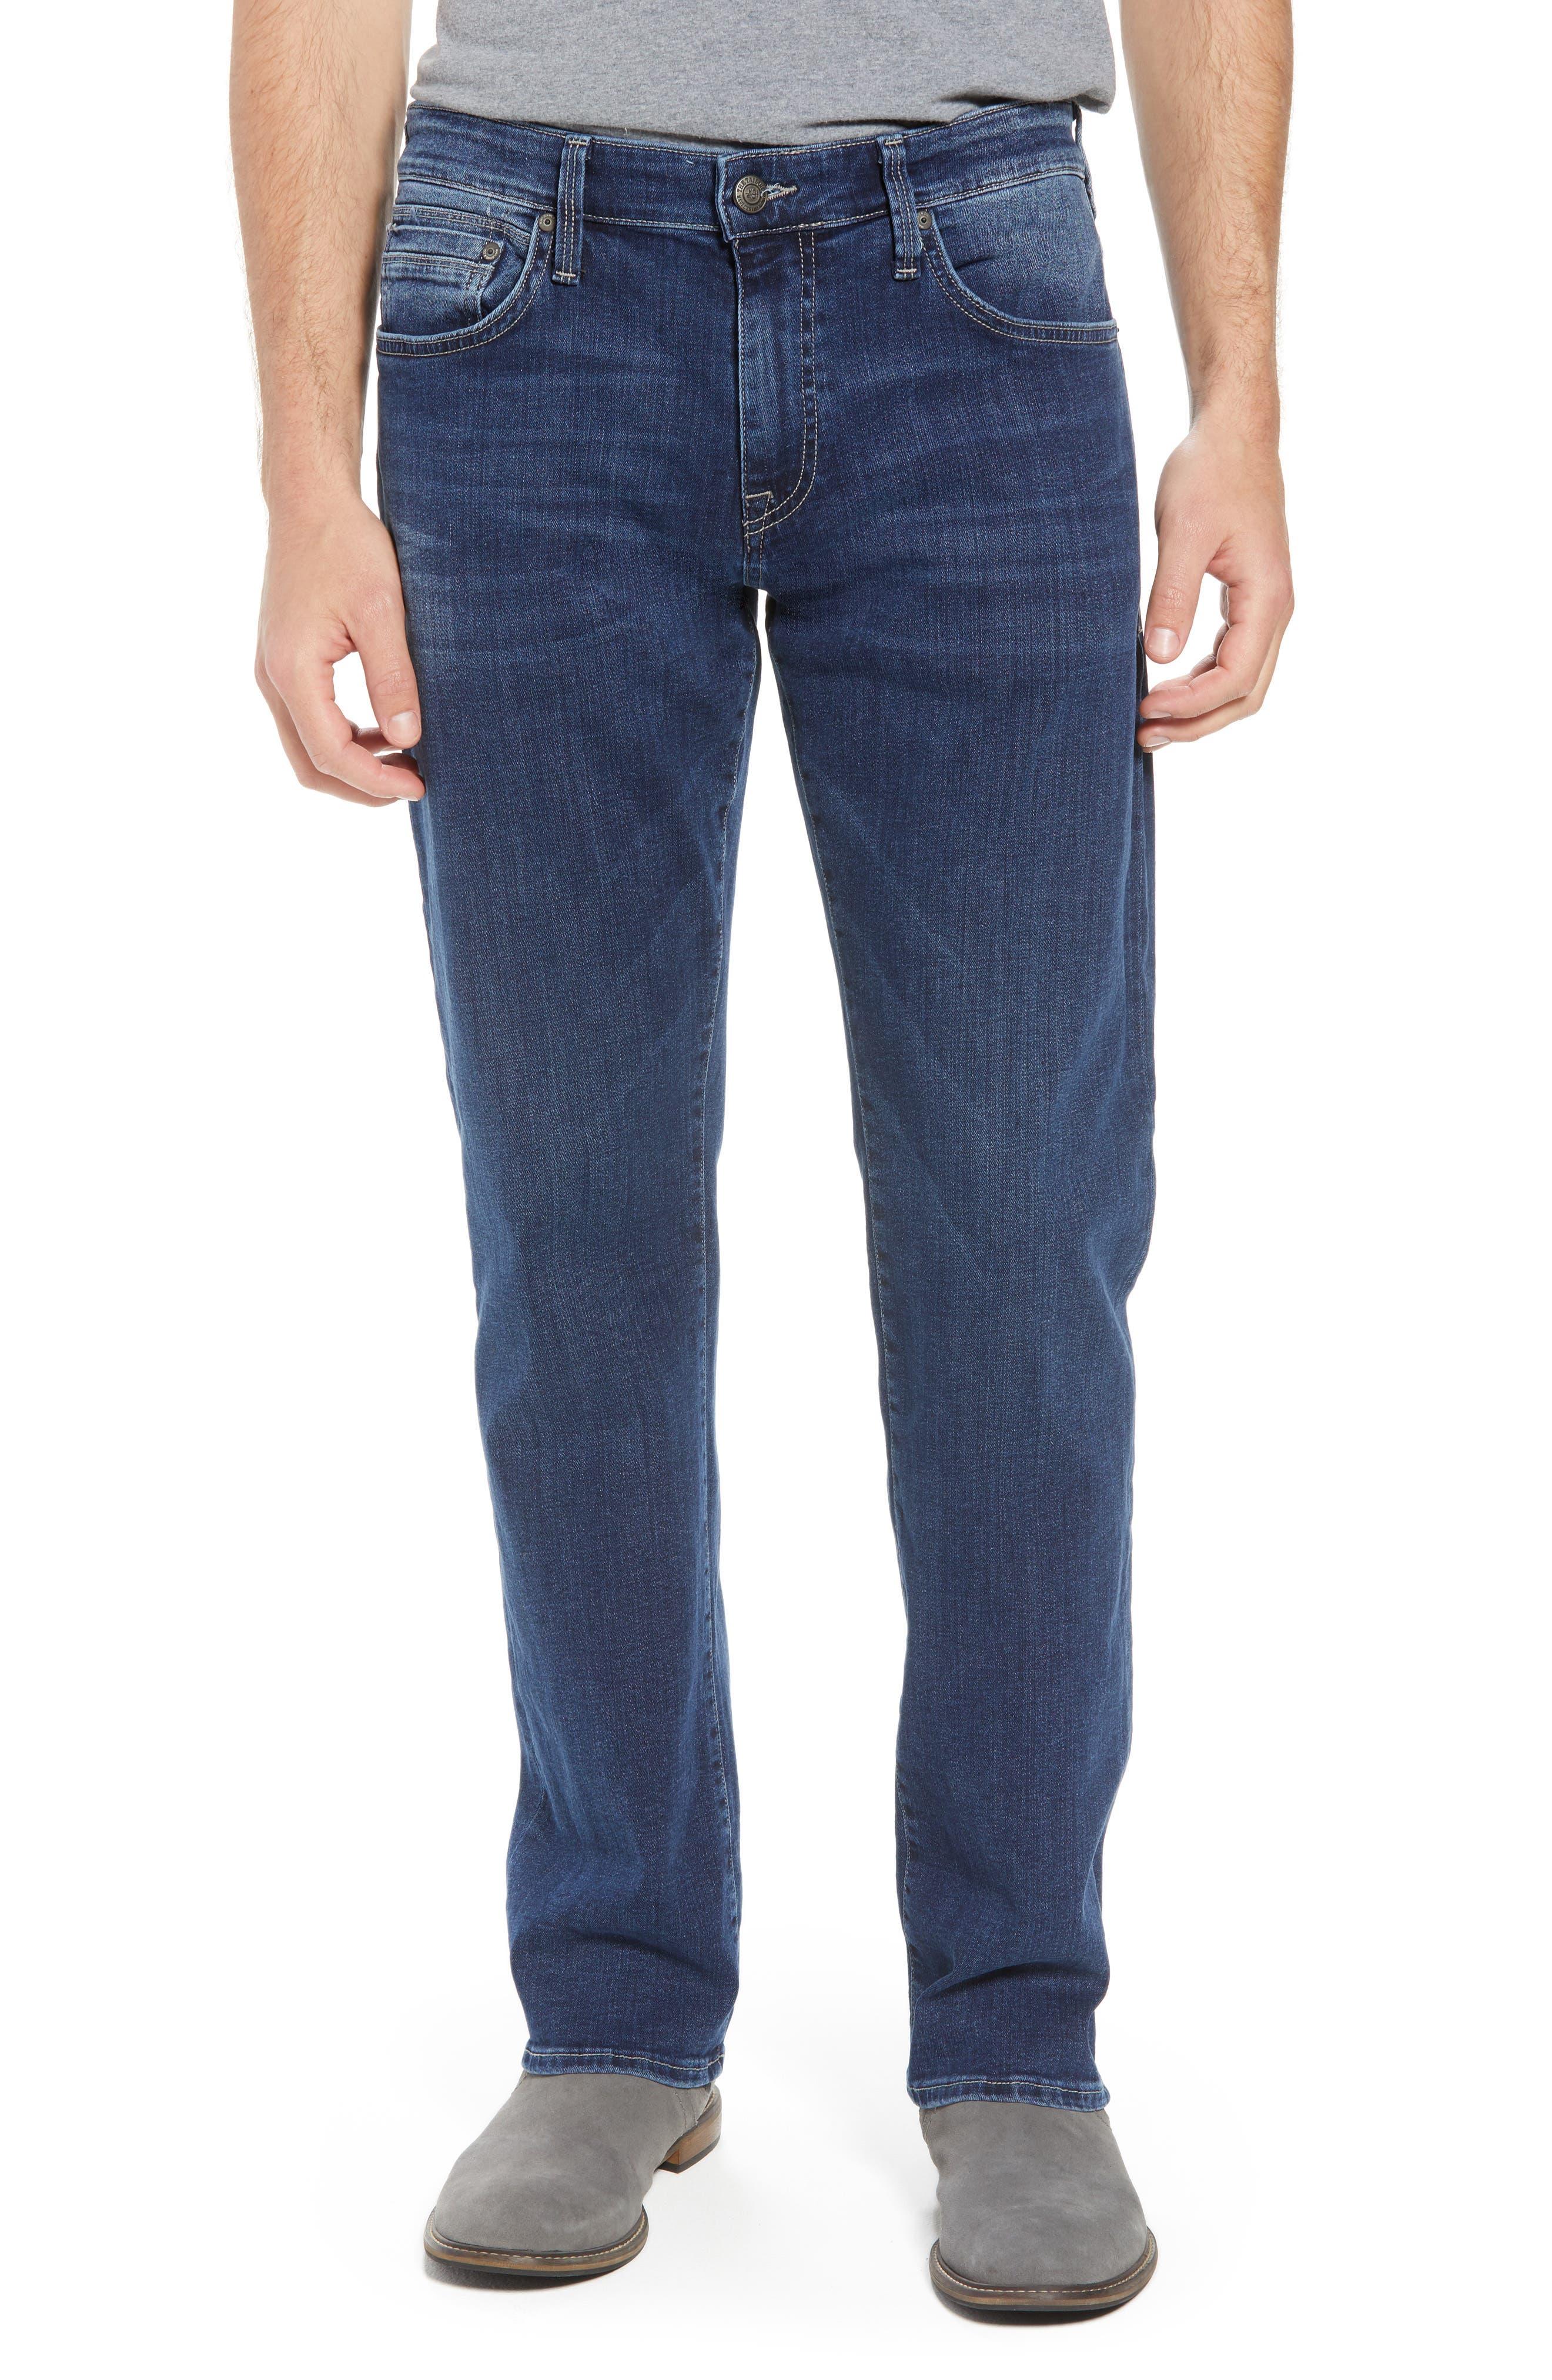 Zach Straight Leg Jeans,                             Main thumbnail 1, color,                             Dark Blue Williamsburg